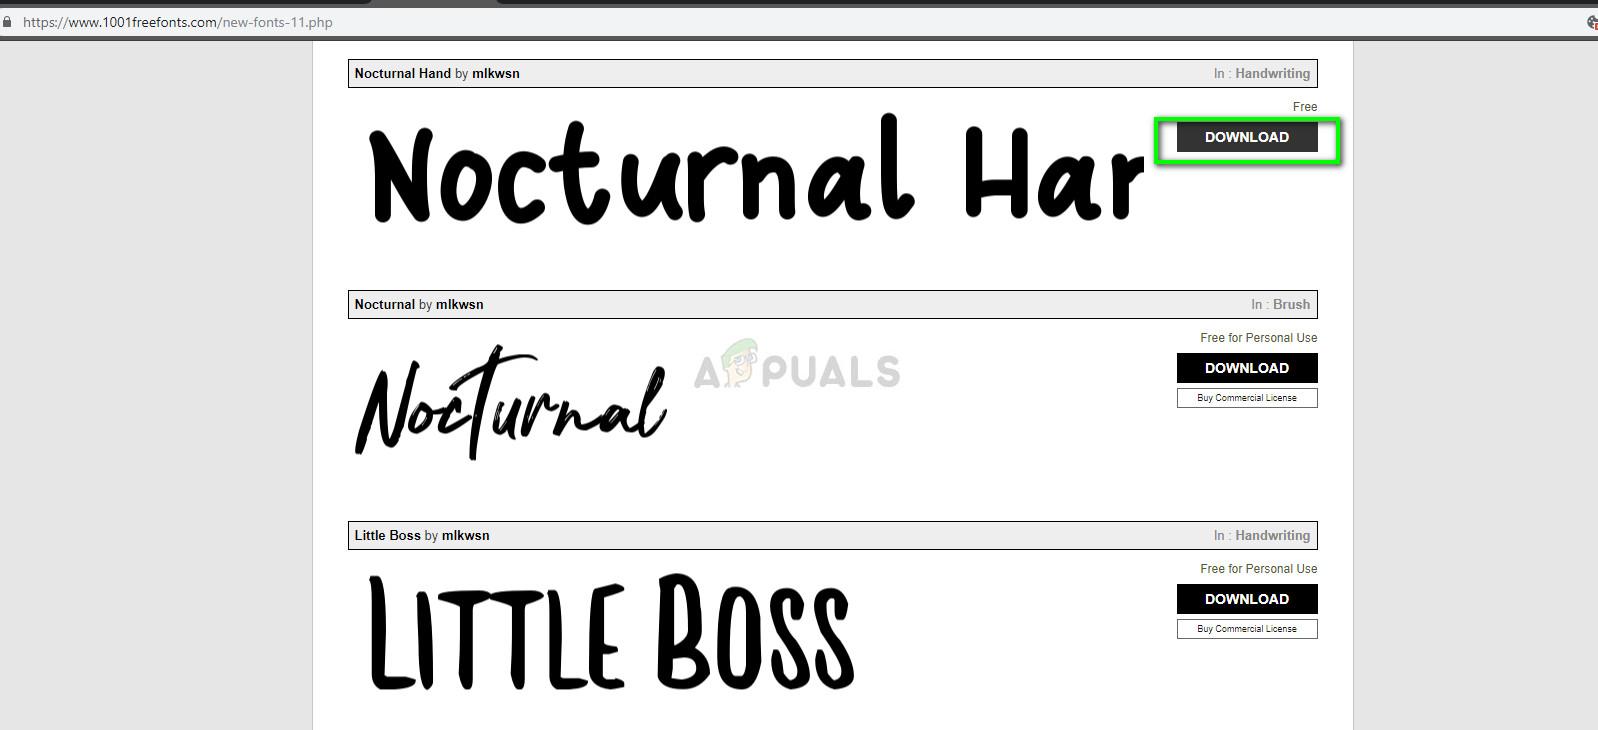 Downloading font file